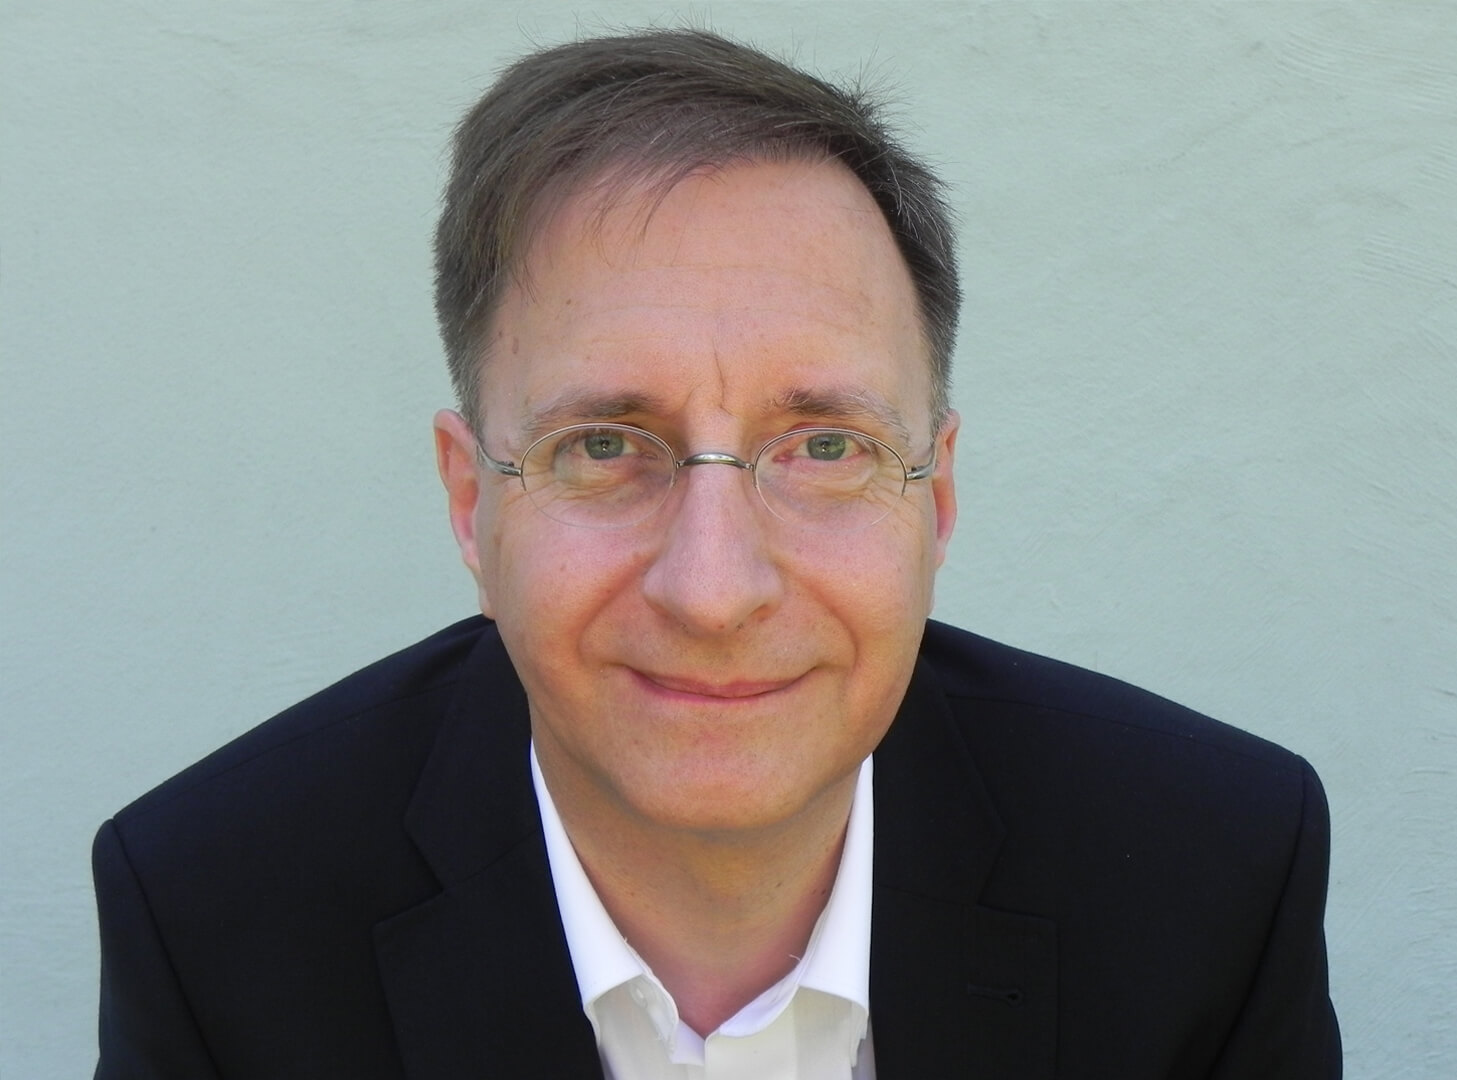 Robert Blood, managing director of NGO